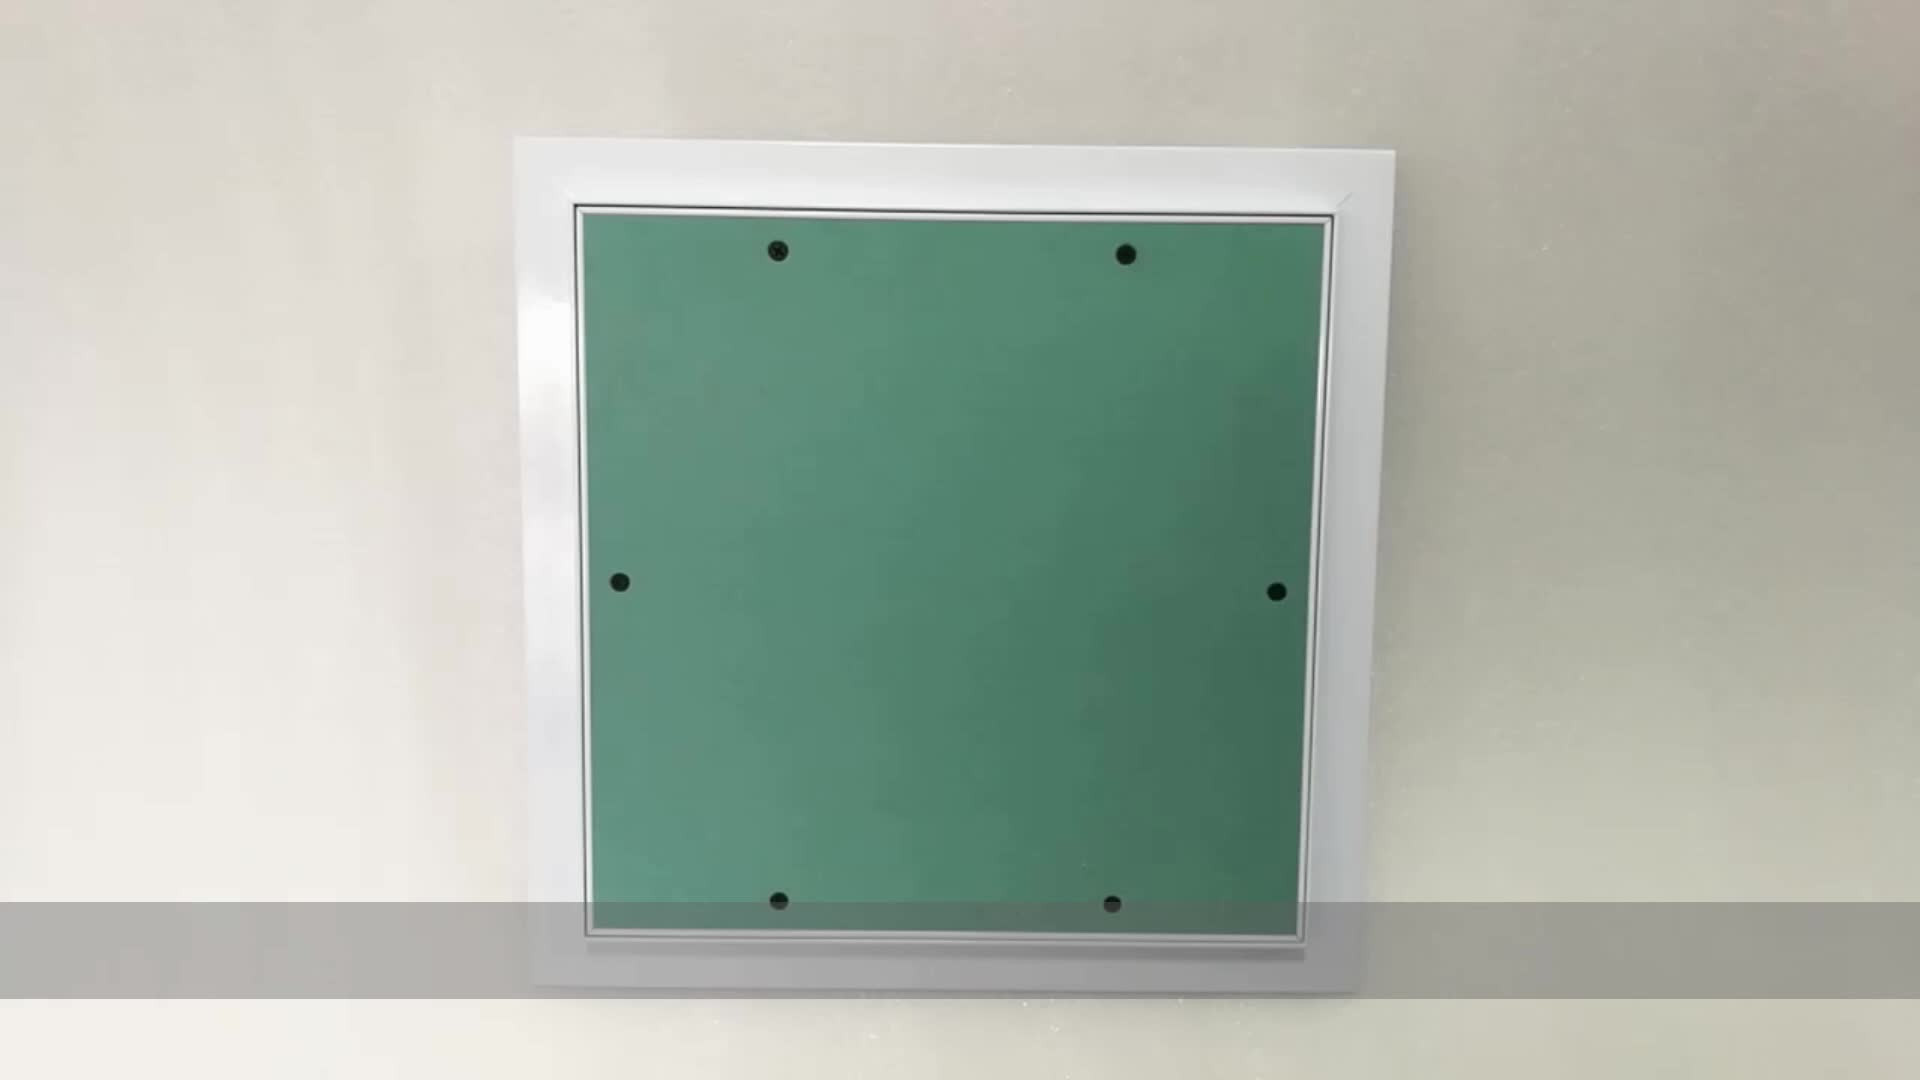 False Ceiling Drywall Access Panel Buy Access Panel